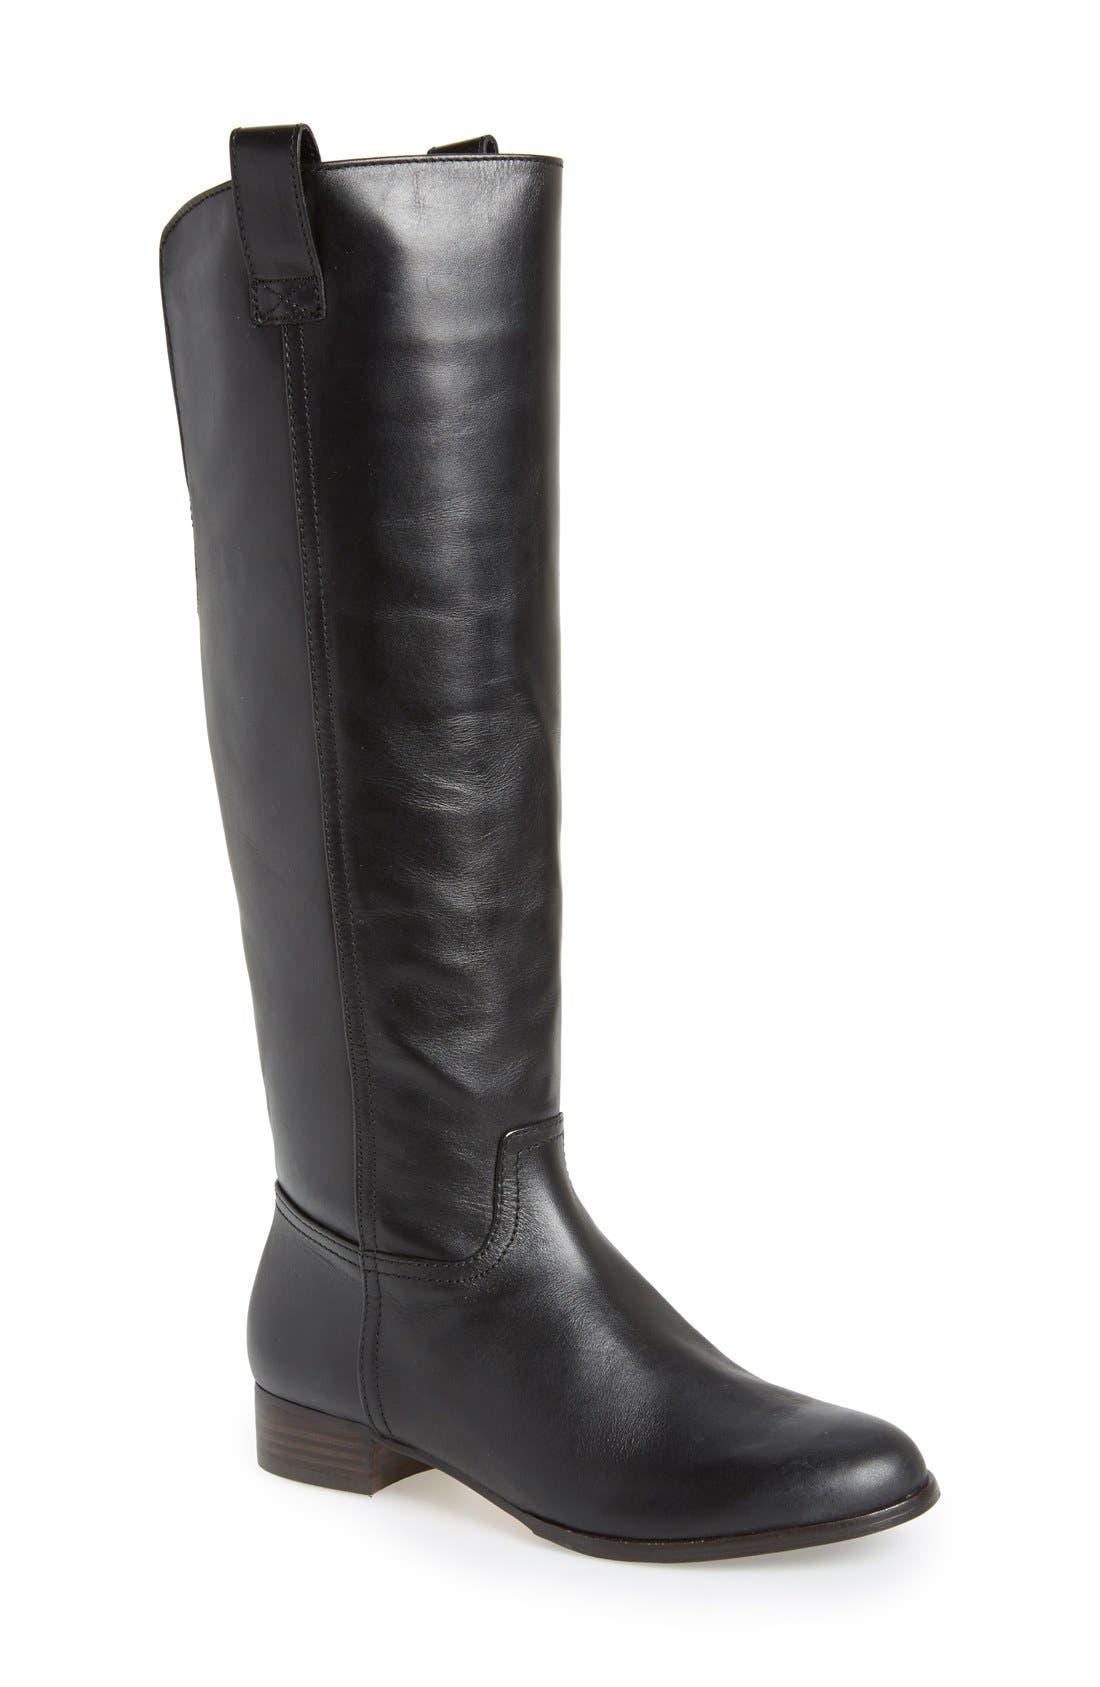 Main Image - Louise et Cie 'Kingcale' Knee High Boot (Women)